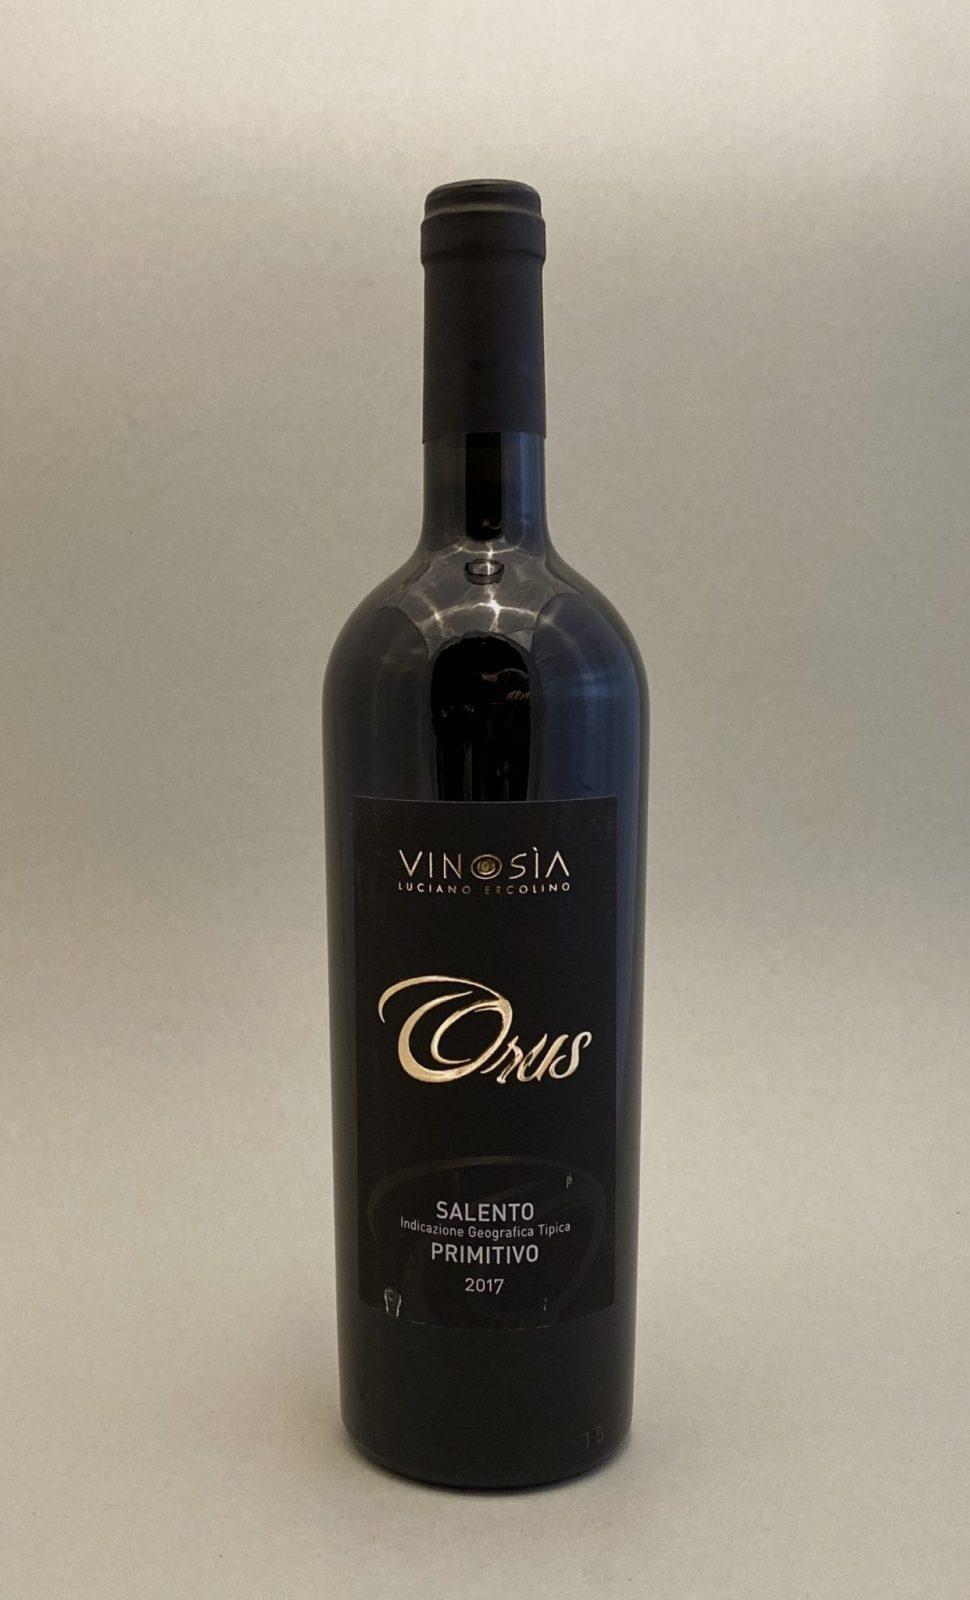 VINOSIA Orus Primitivo 2017, vinoteka Sunny wines slnecnice mesto, Bratislava petrzalka, vino červené z Talianska